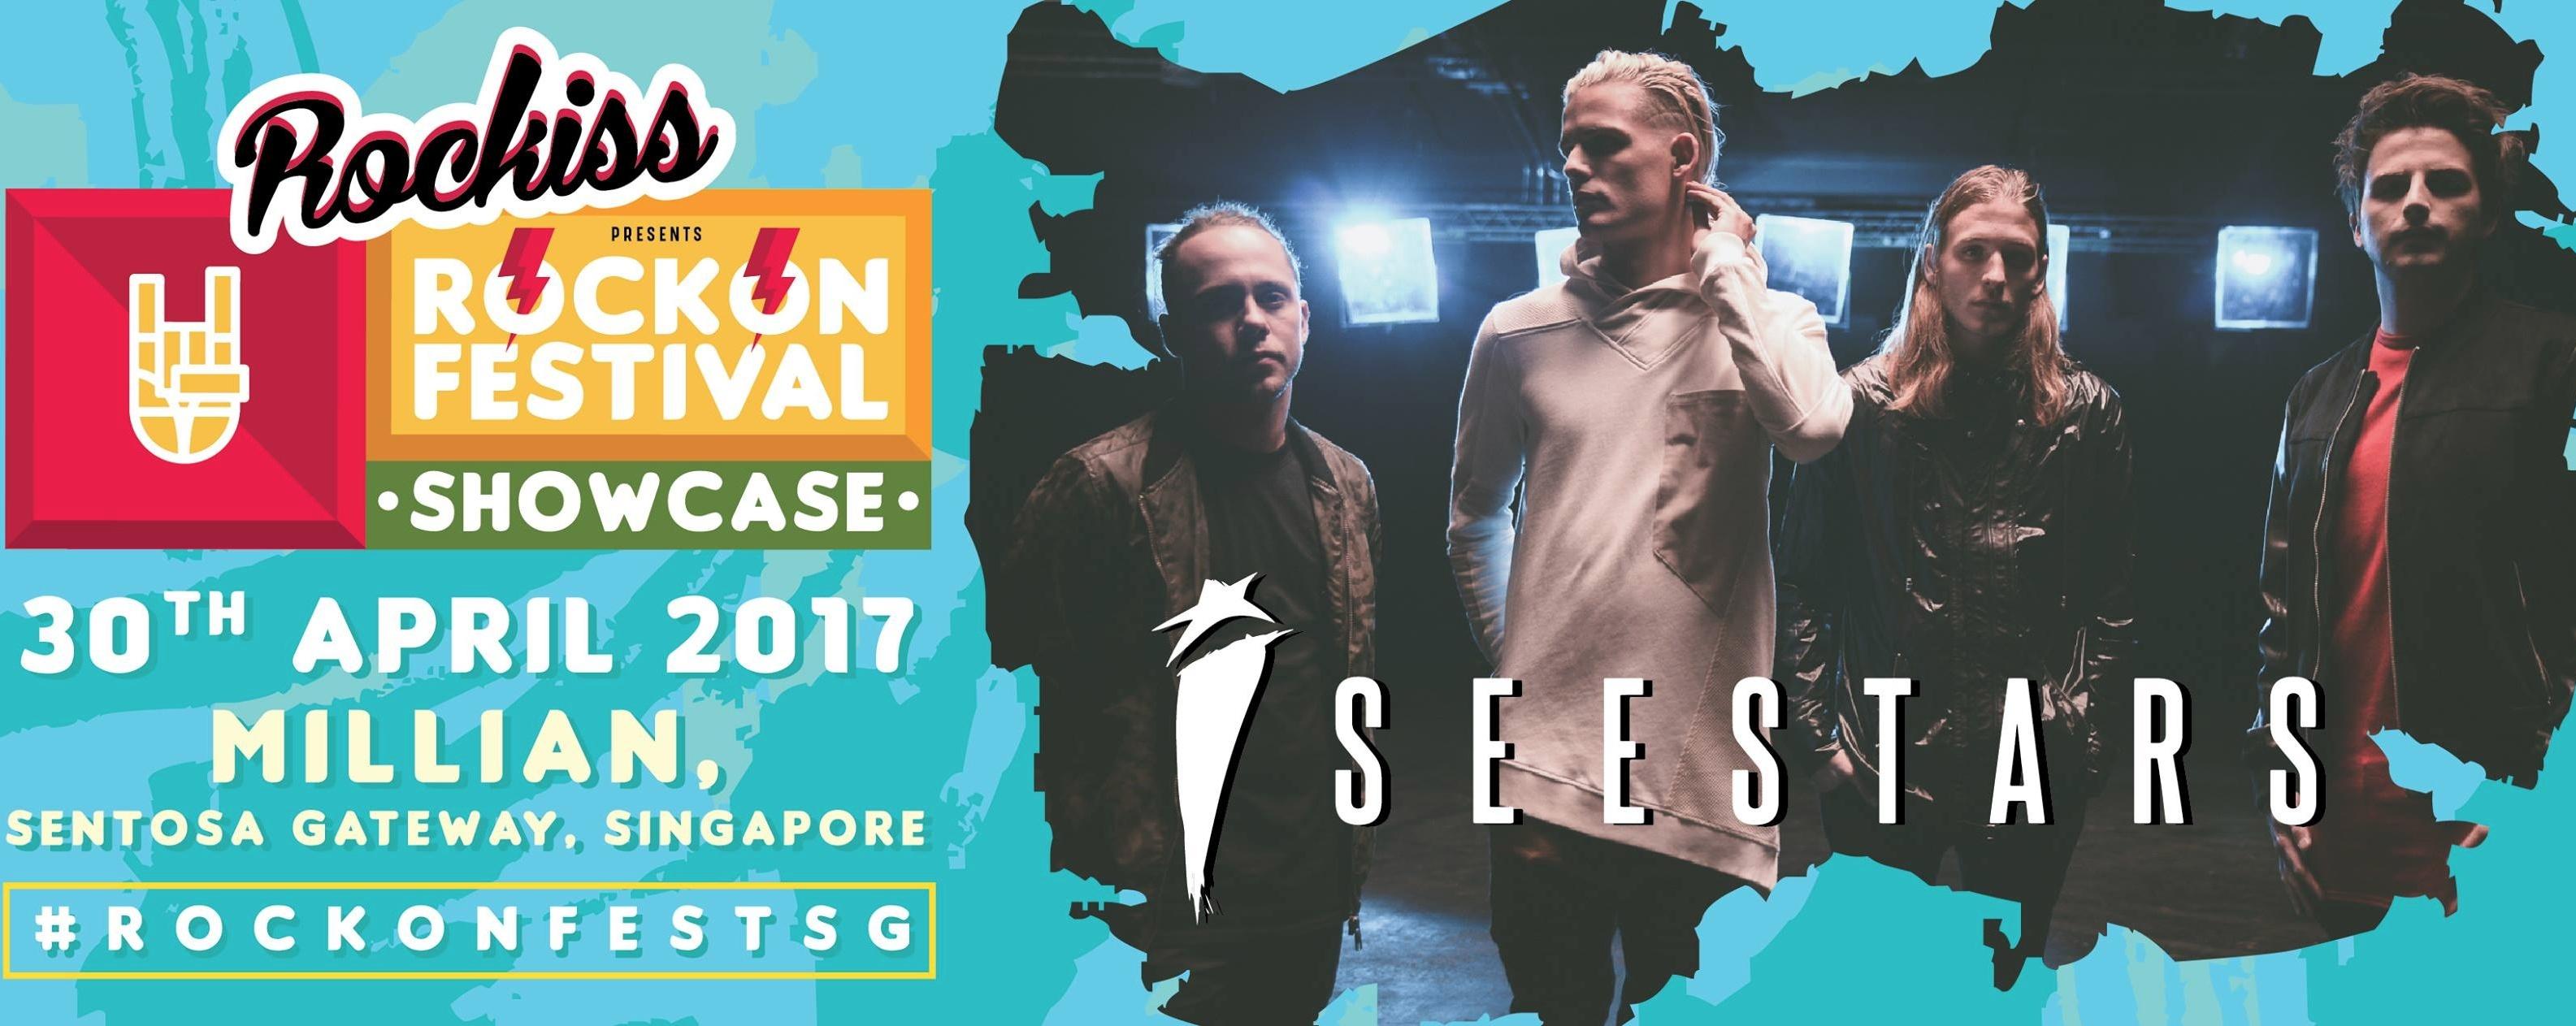 Rockiss Rockton Festival Showcase: I See Stars live in Singapore